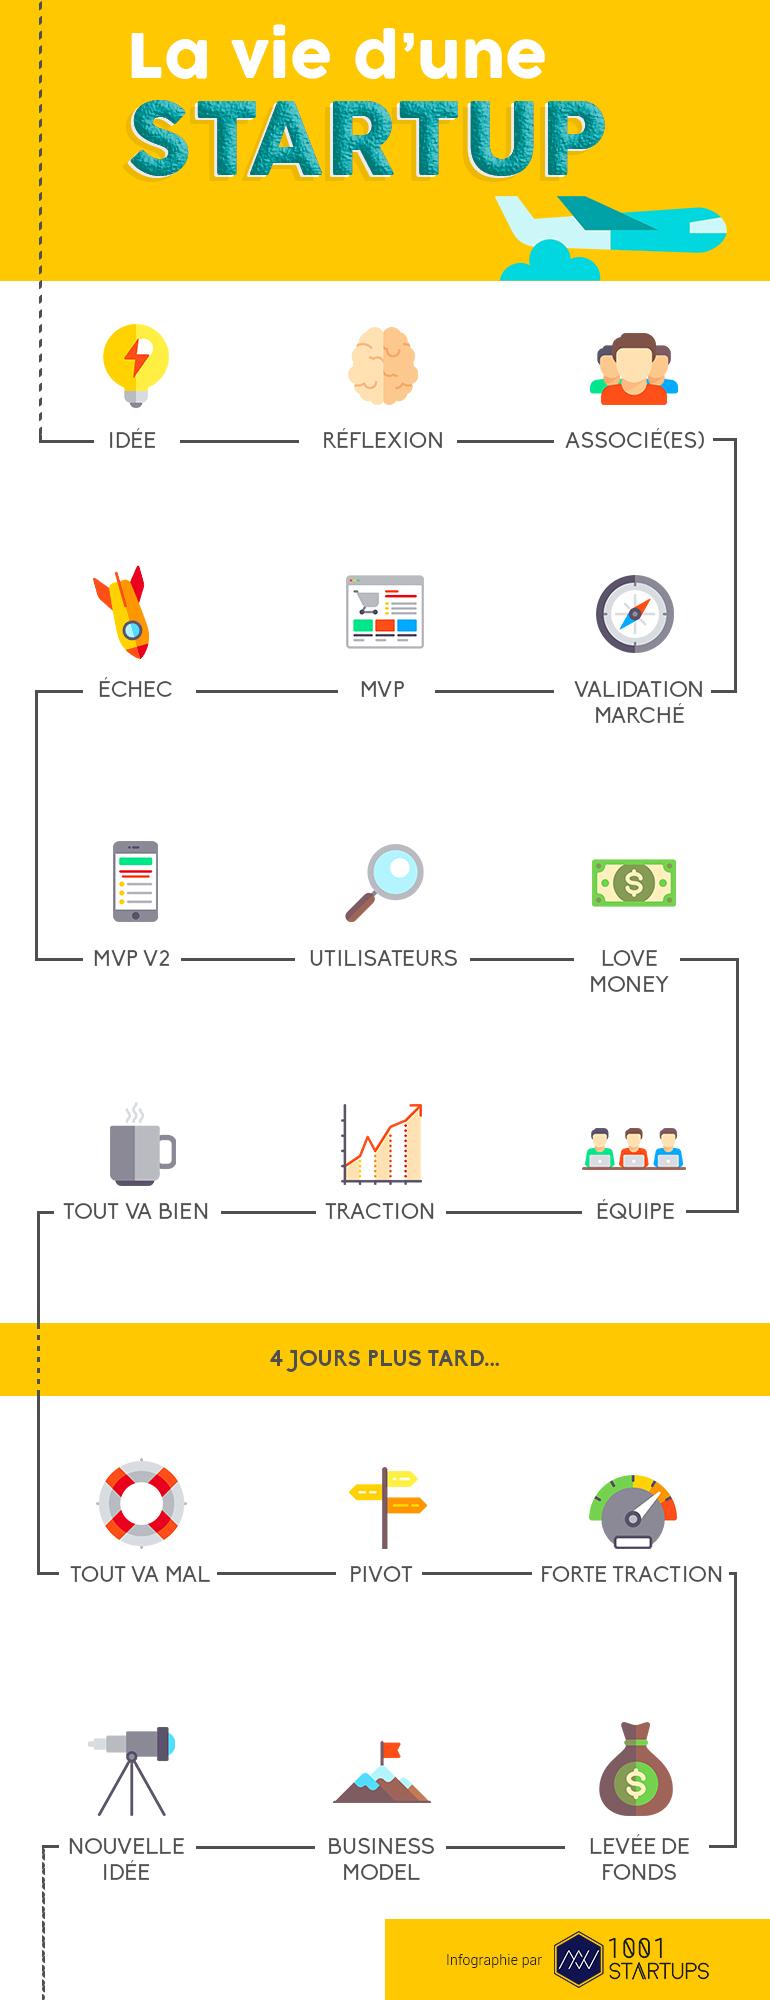 Infographie entrepreneur la vie d 39 une start up for Idee start up 2016